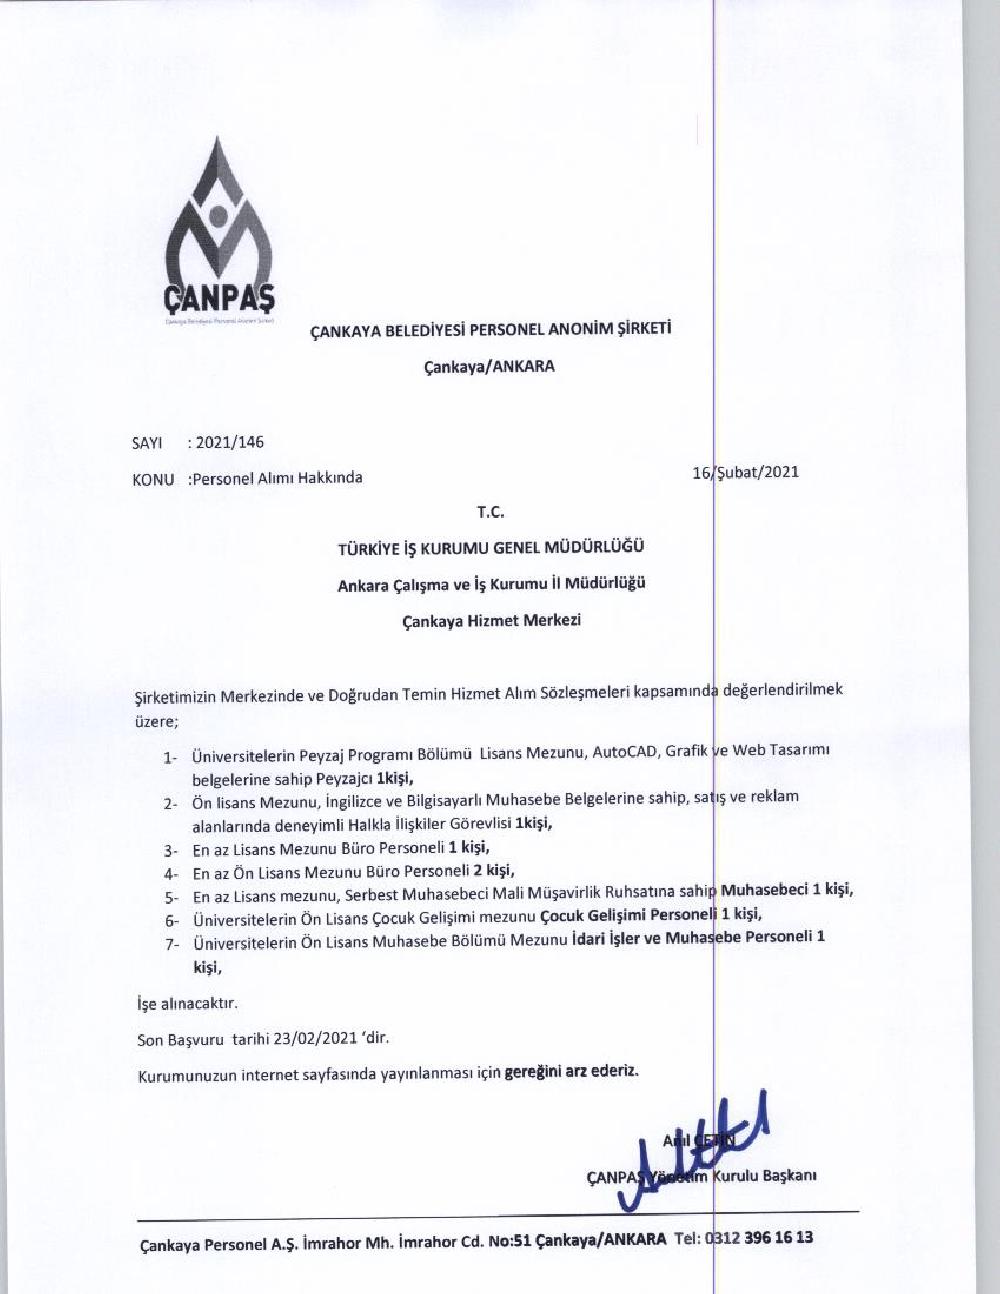 ankara-cankaya-belediyesi-per-a-s-23-02-2021-000001.png